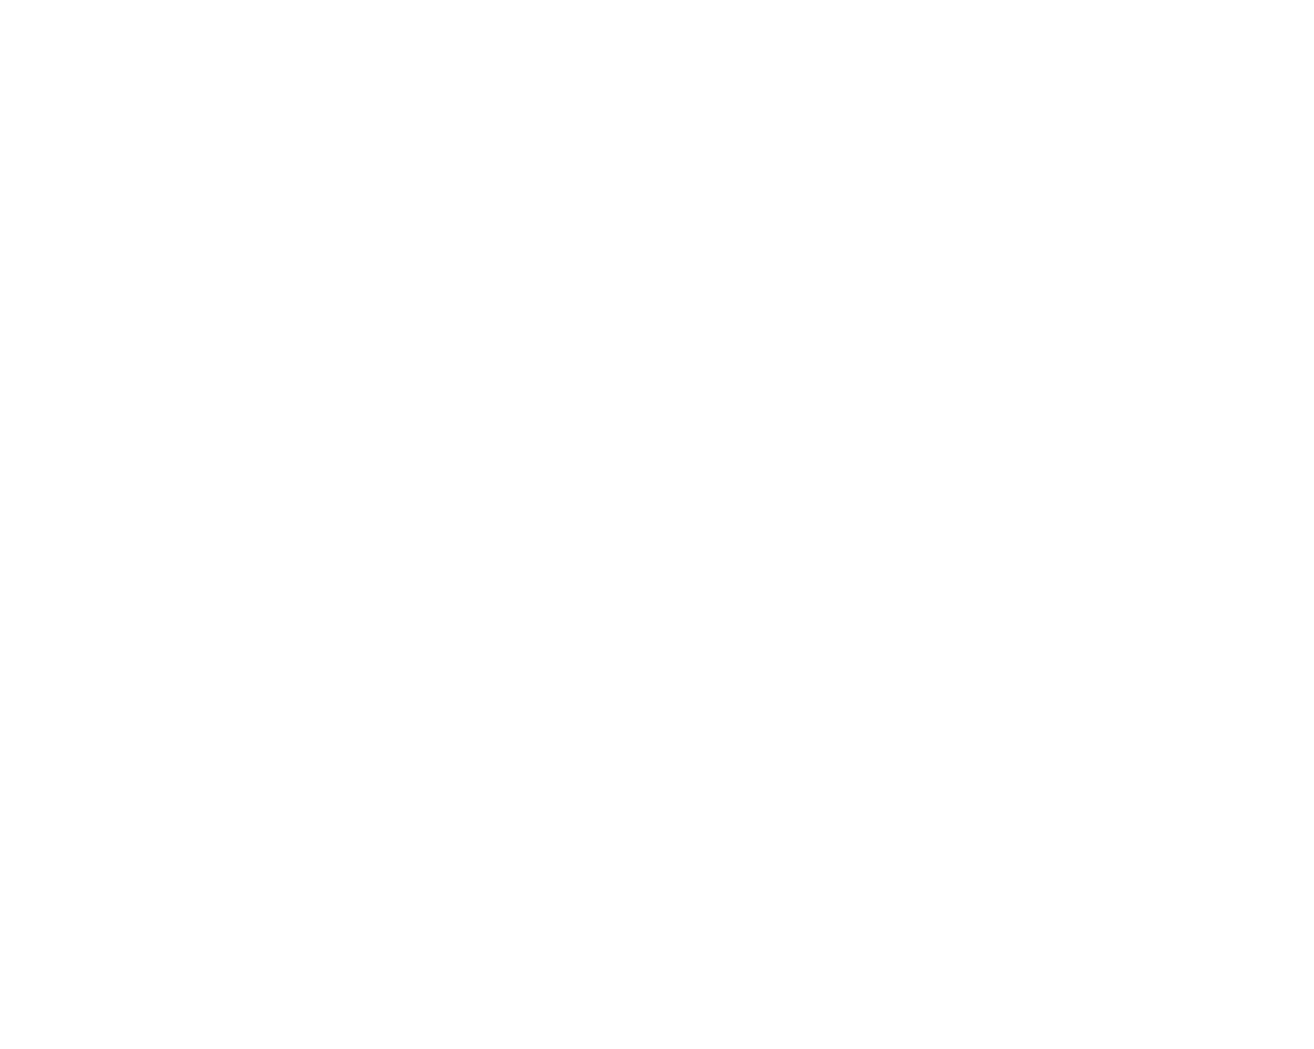 Nikolaos Vassos Creates - Envy Creates